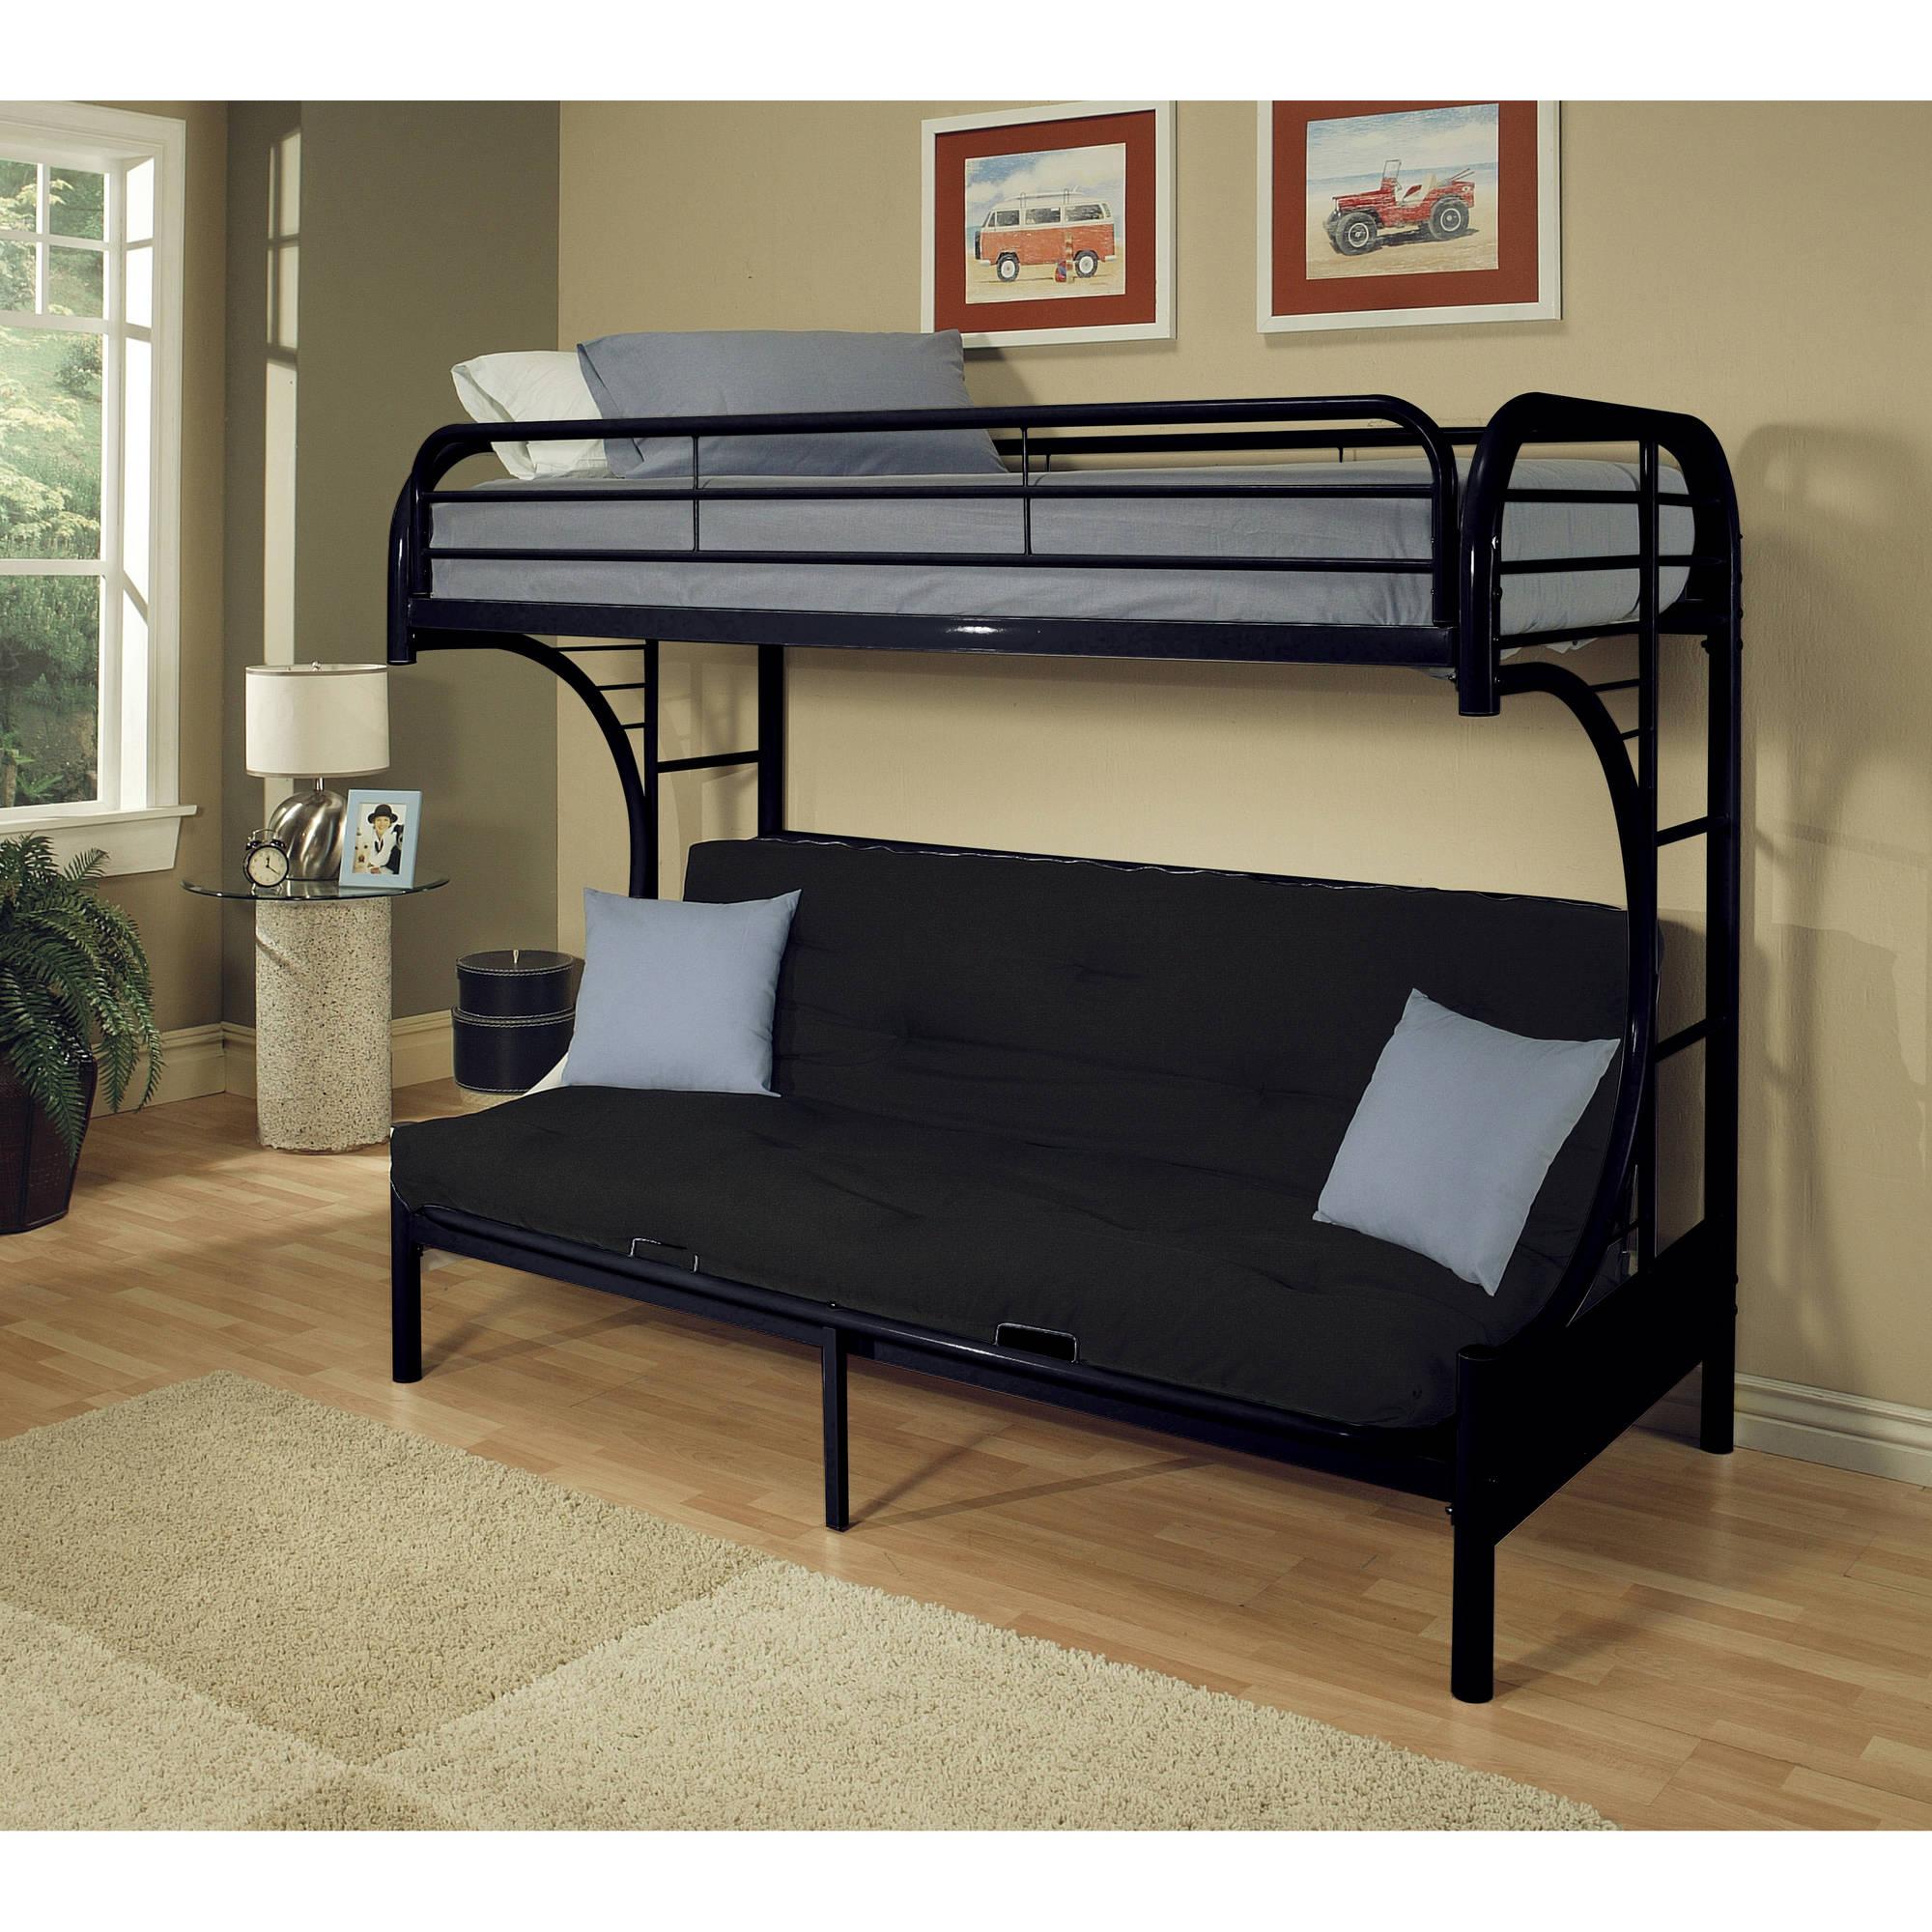 futon beds acme eclipse twin xl over futon metal bunk bed, black - walmart.com KRMAWSQ